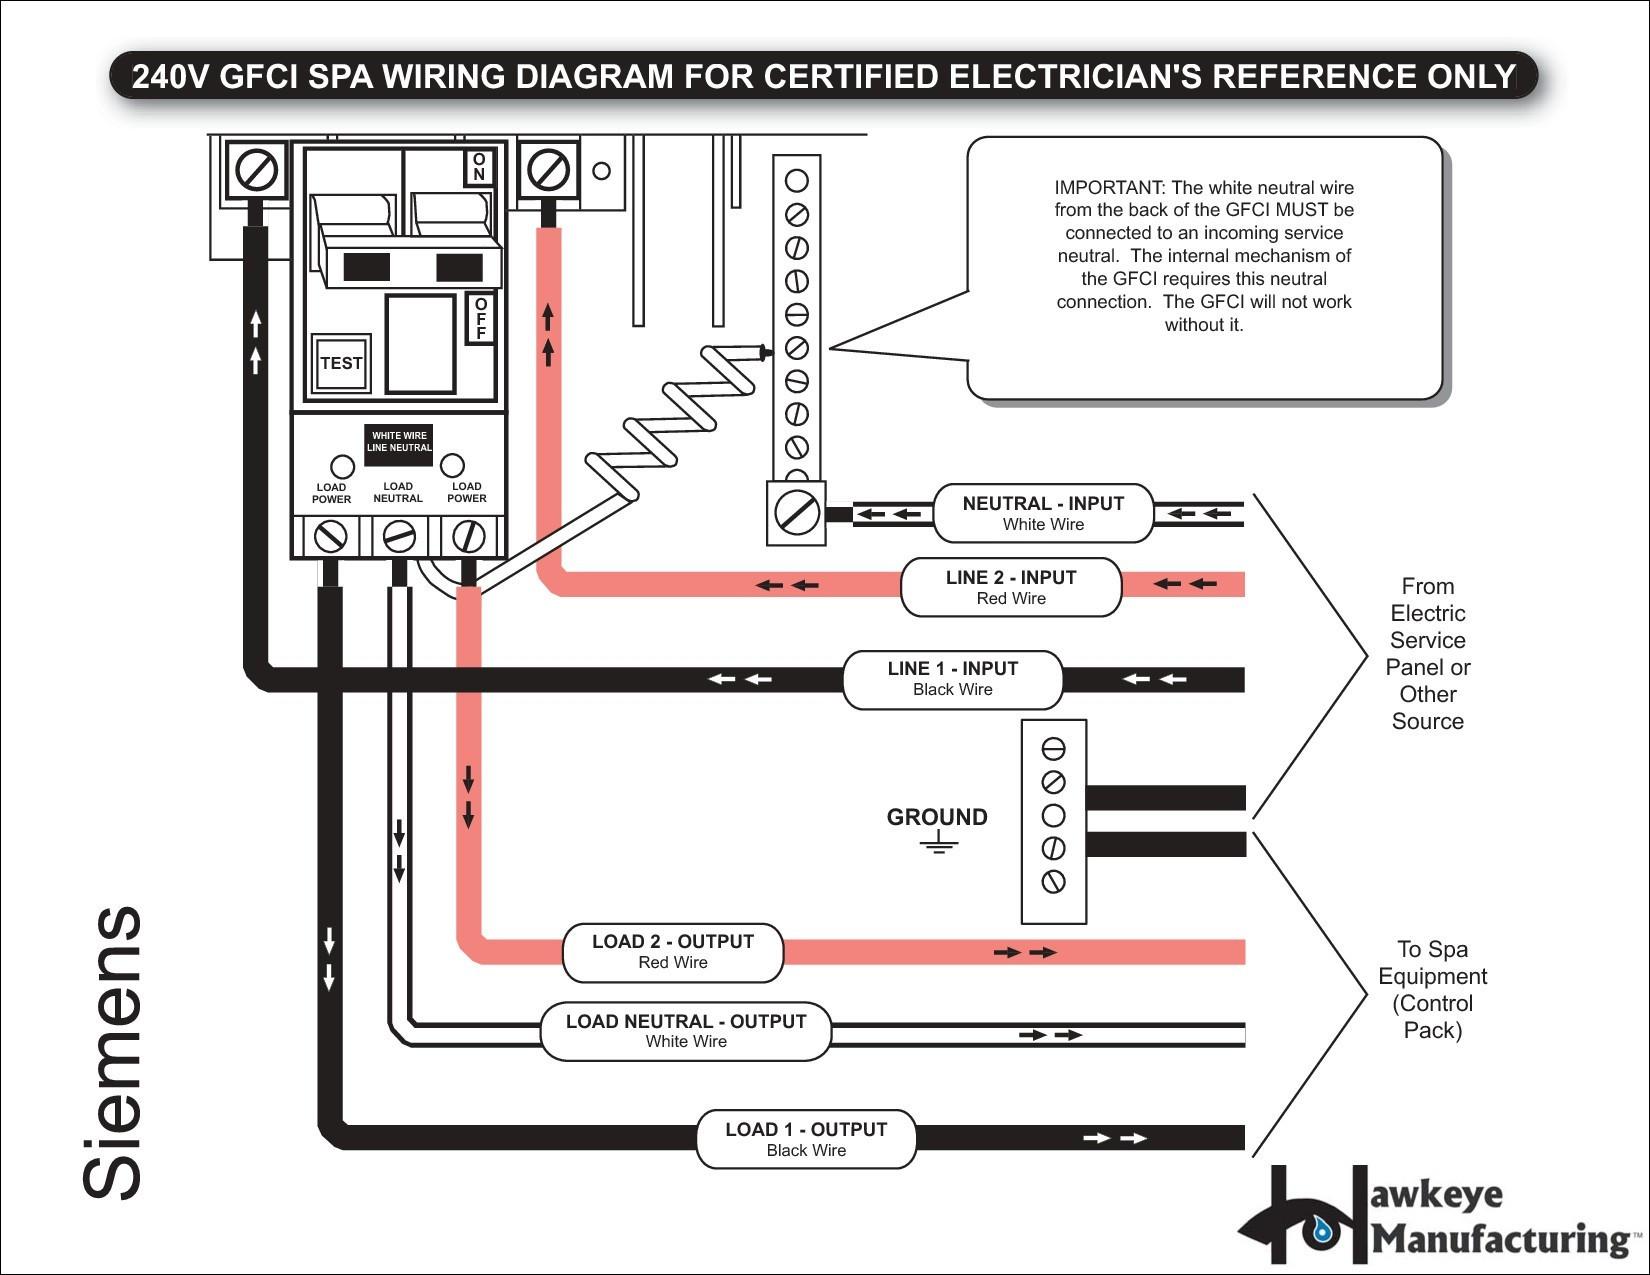 220v Hot Tub Wiring Diagram